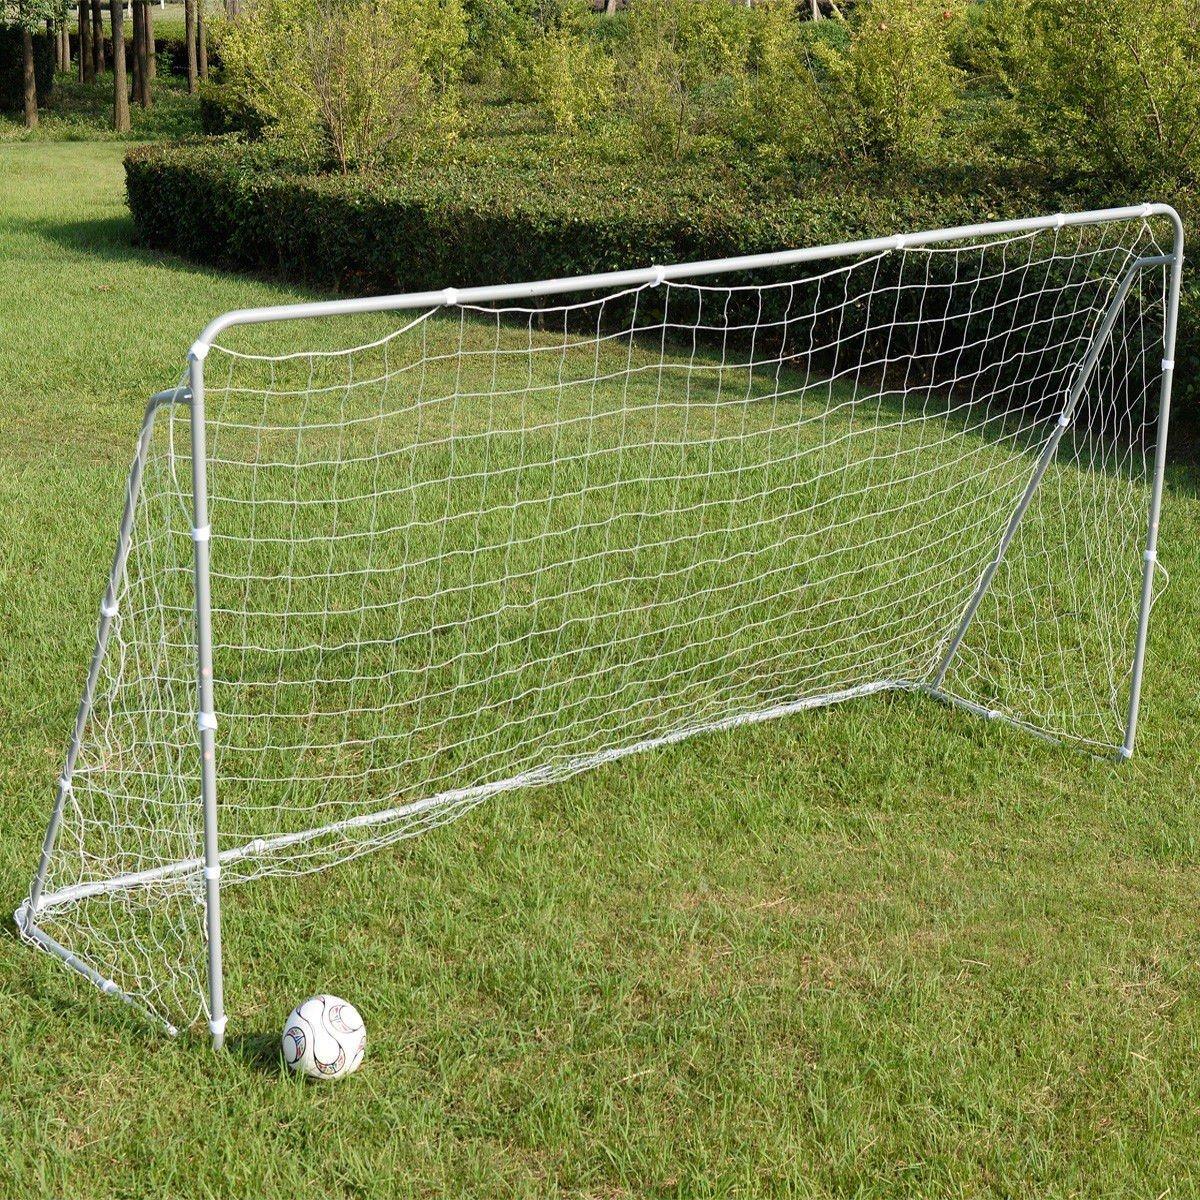 Soccer goal 12 ' x 6 ' Football W / Netベルクロストラップ、アンカーボールトレーニングセット B076XPMFKV